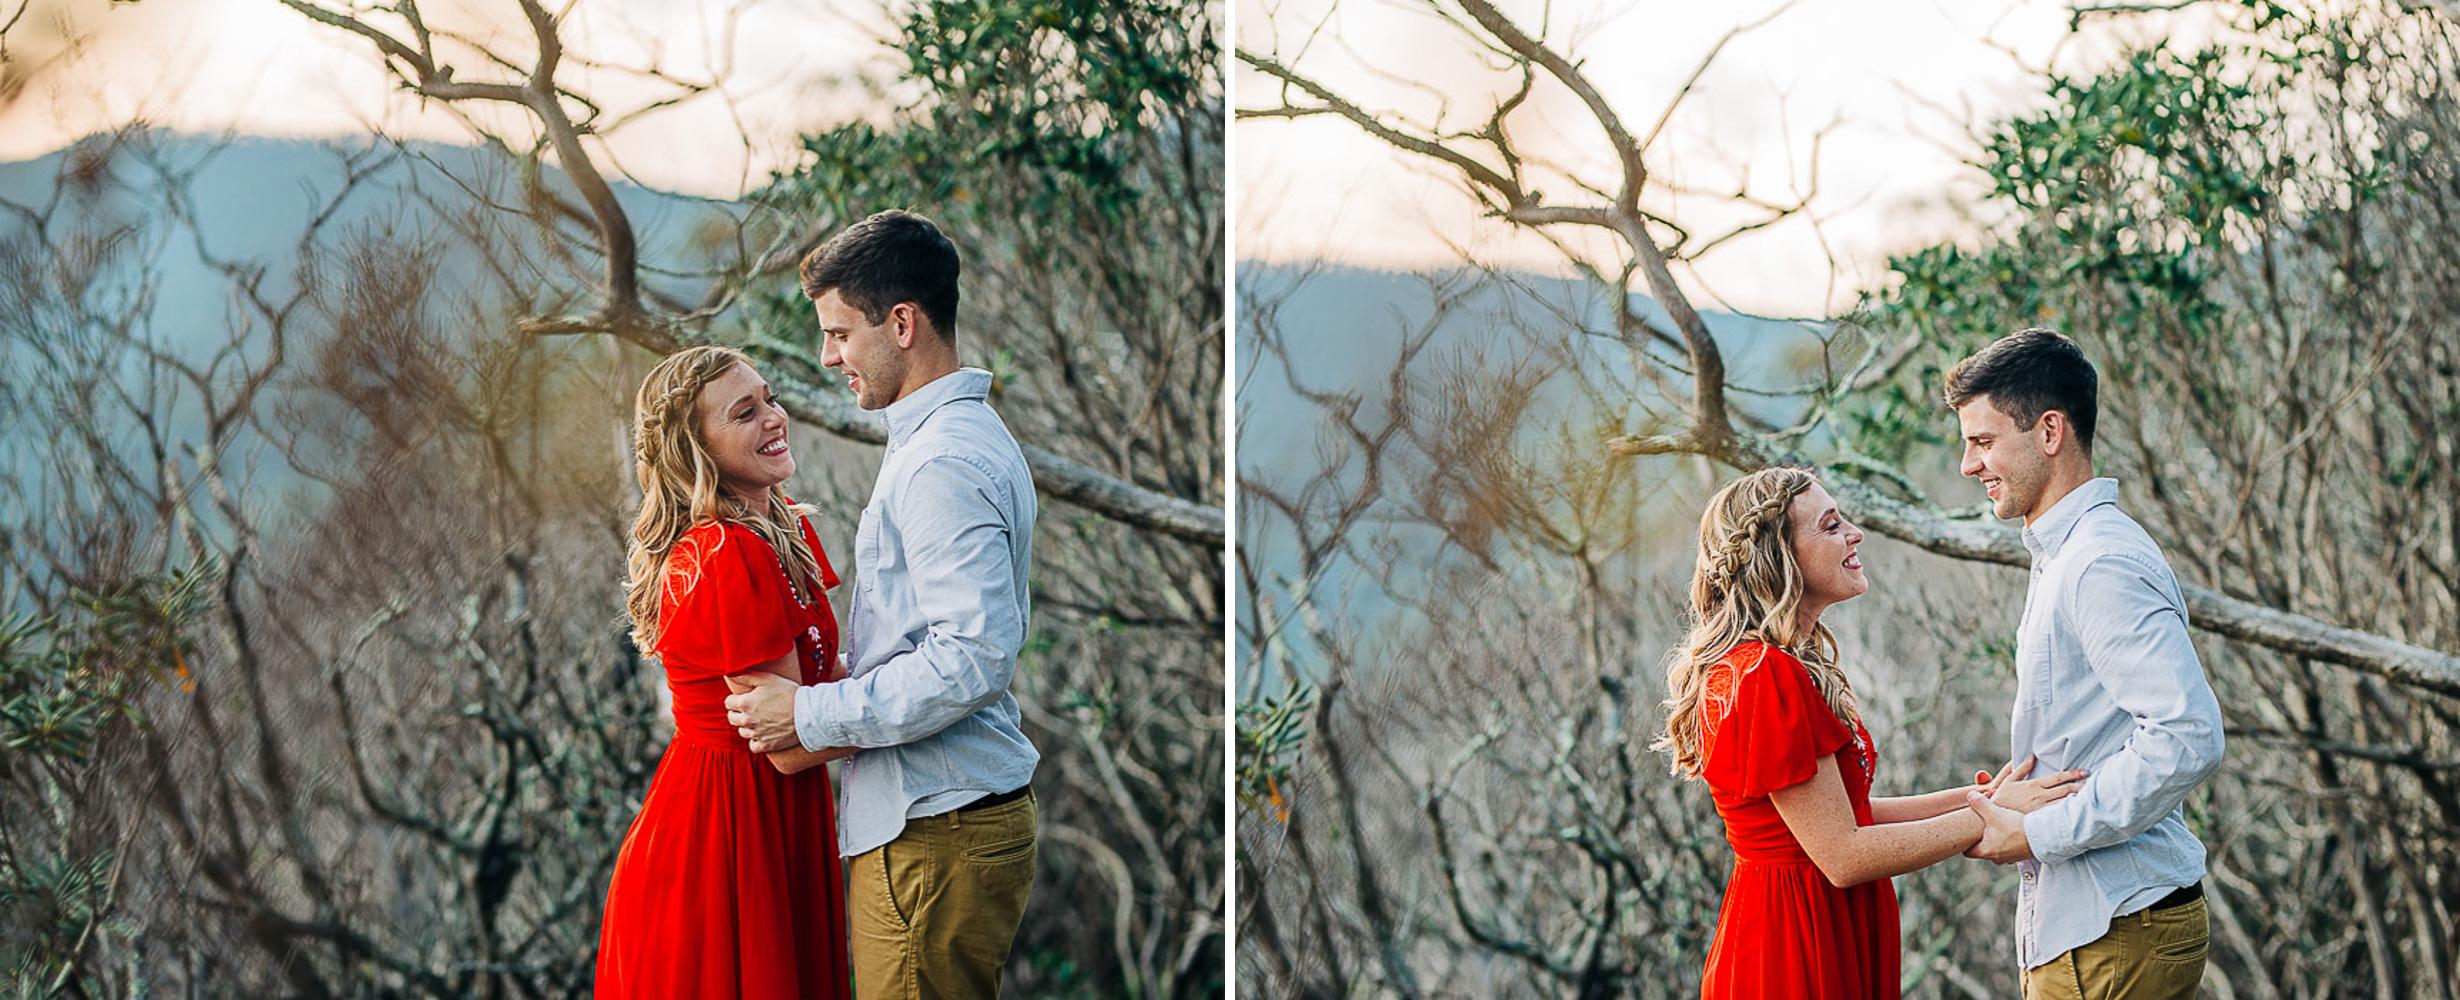 Engagement Portraits 05.jpg